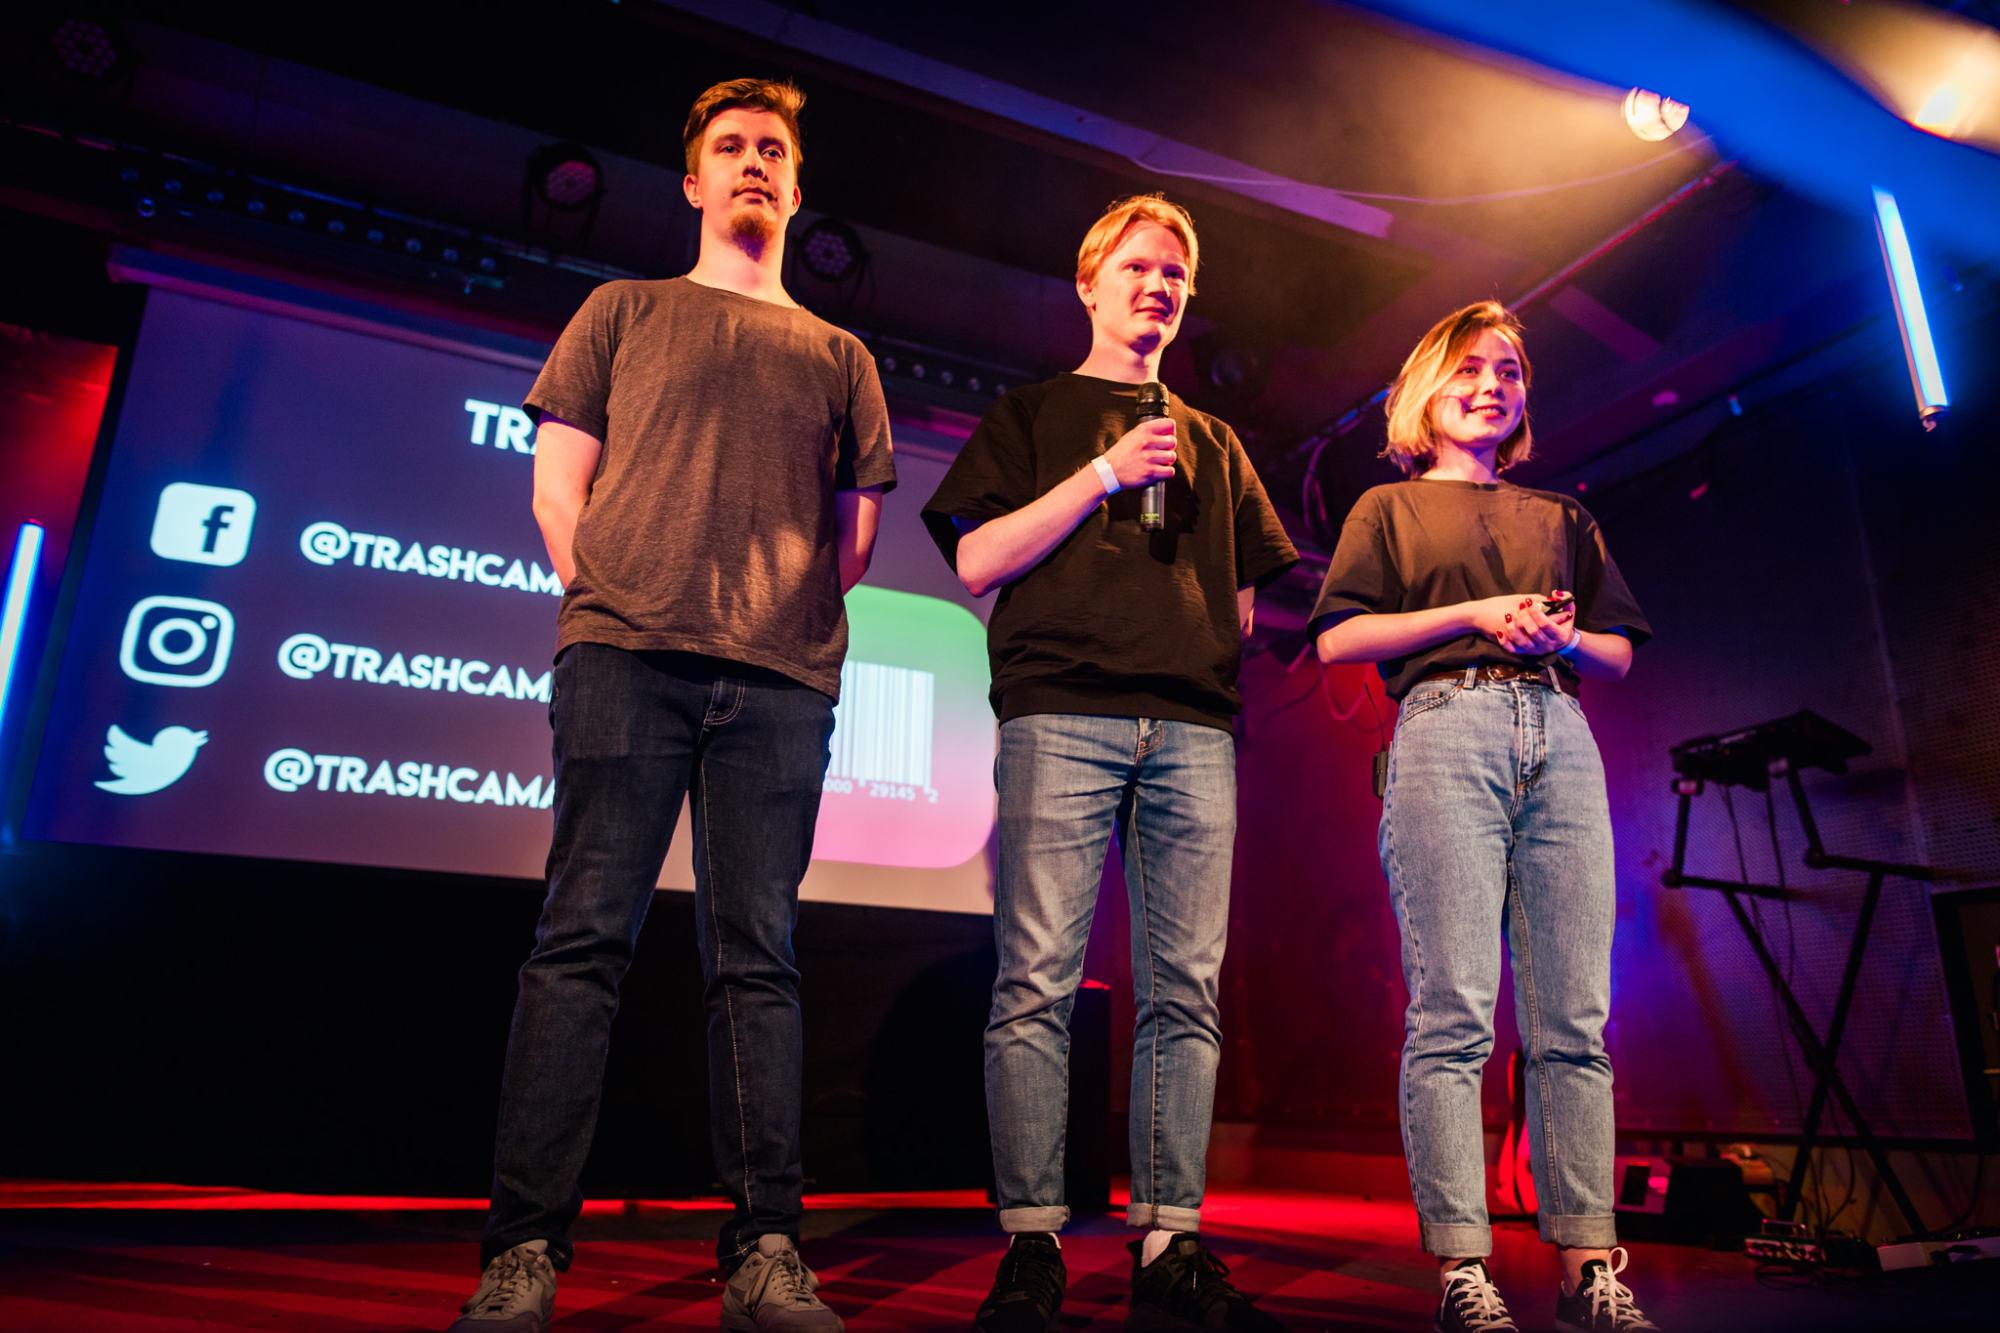 Three people on a stage